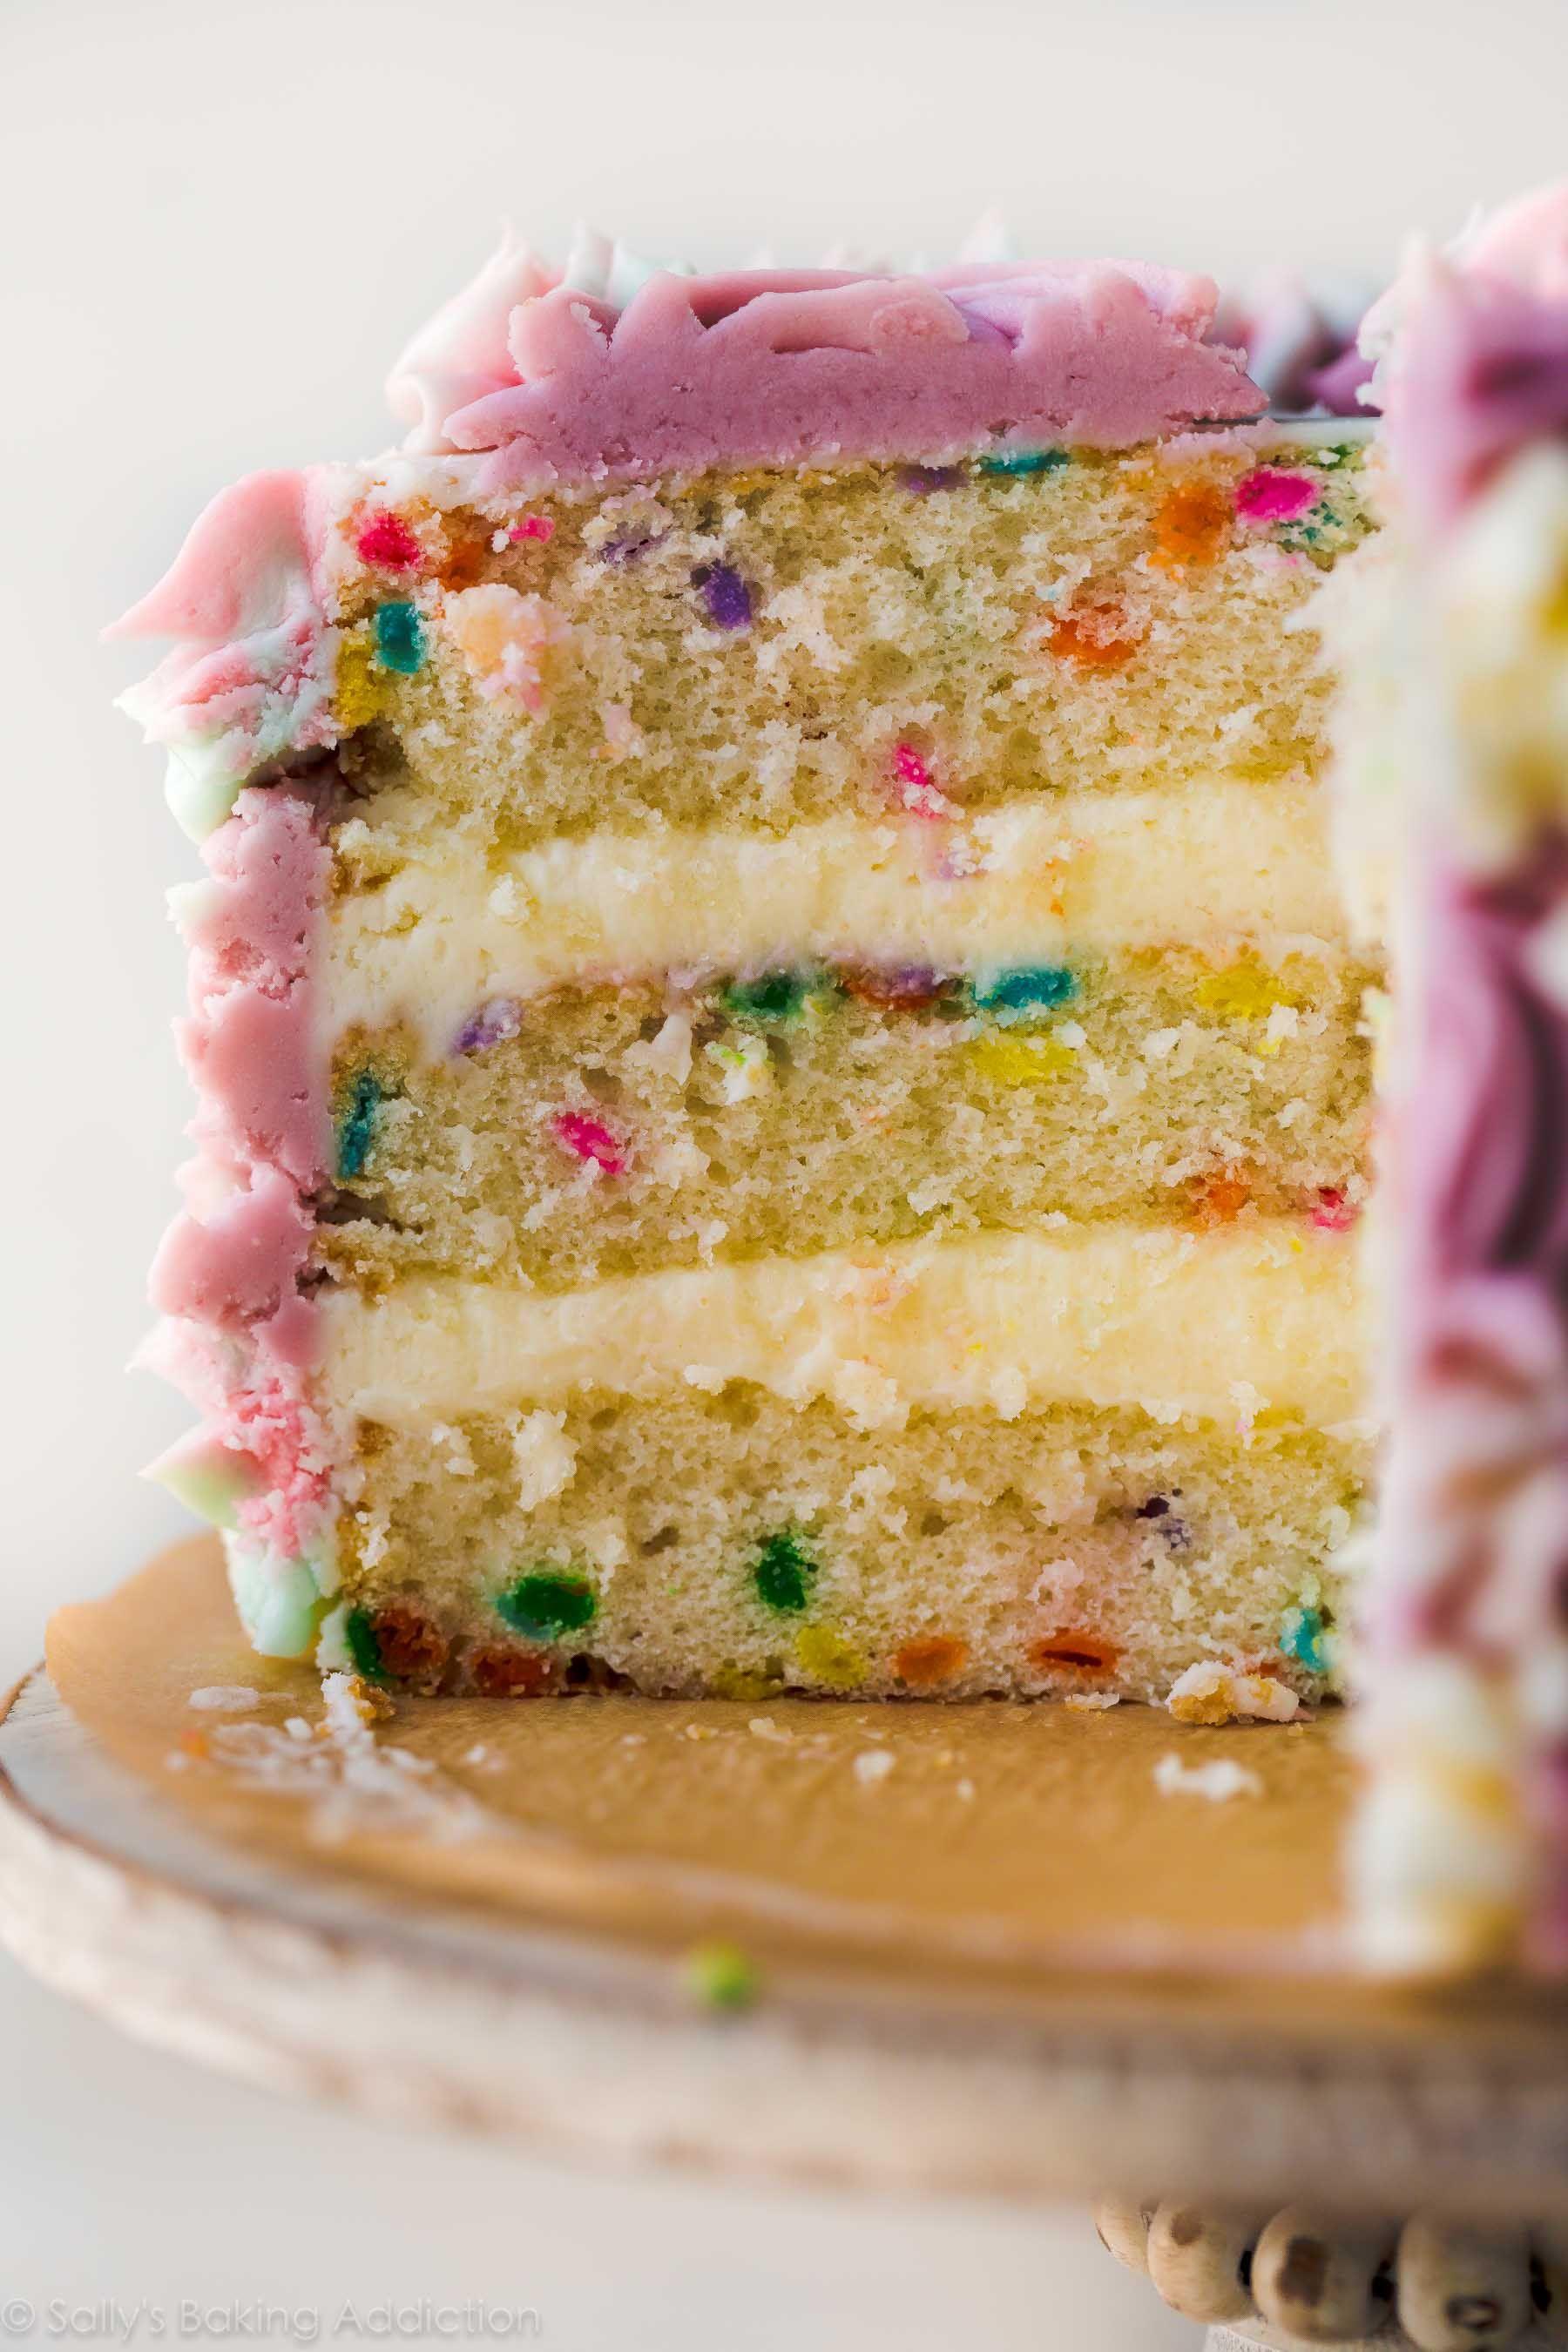 30+ Sallys Baking Addiction Cake